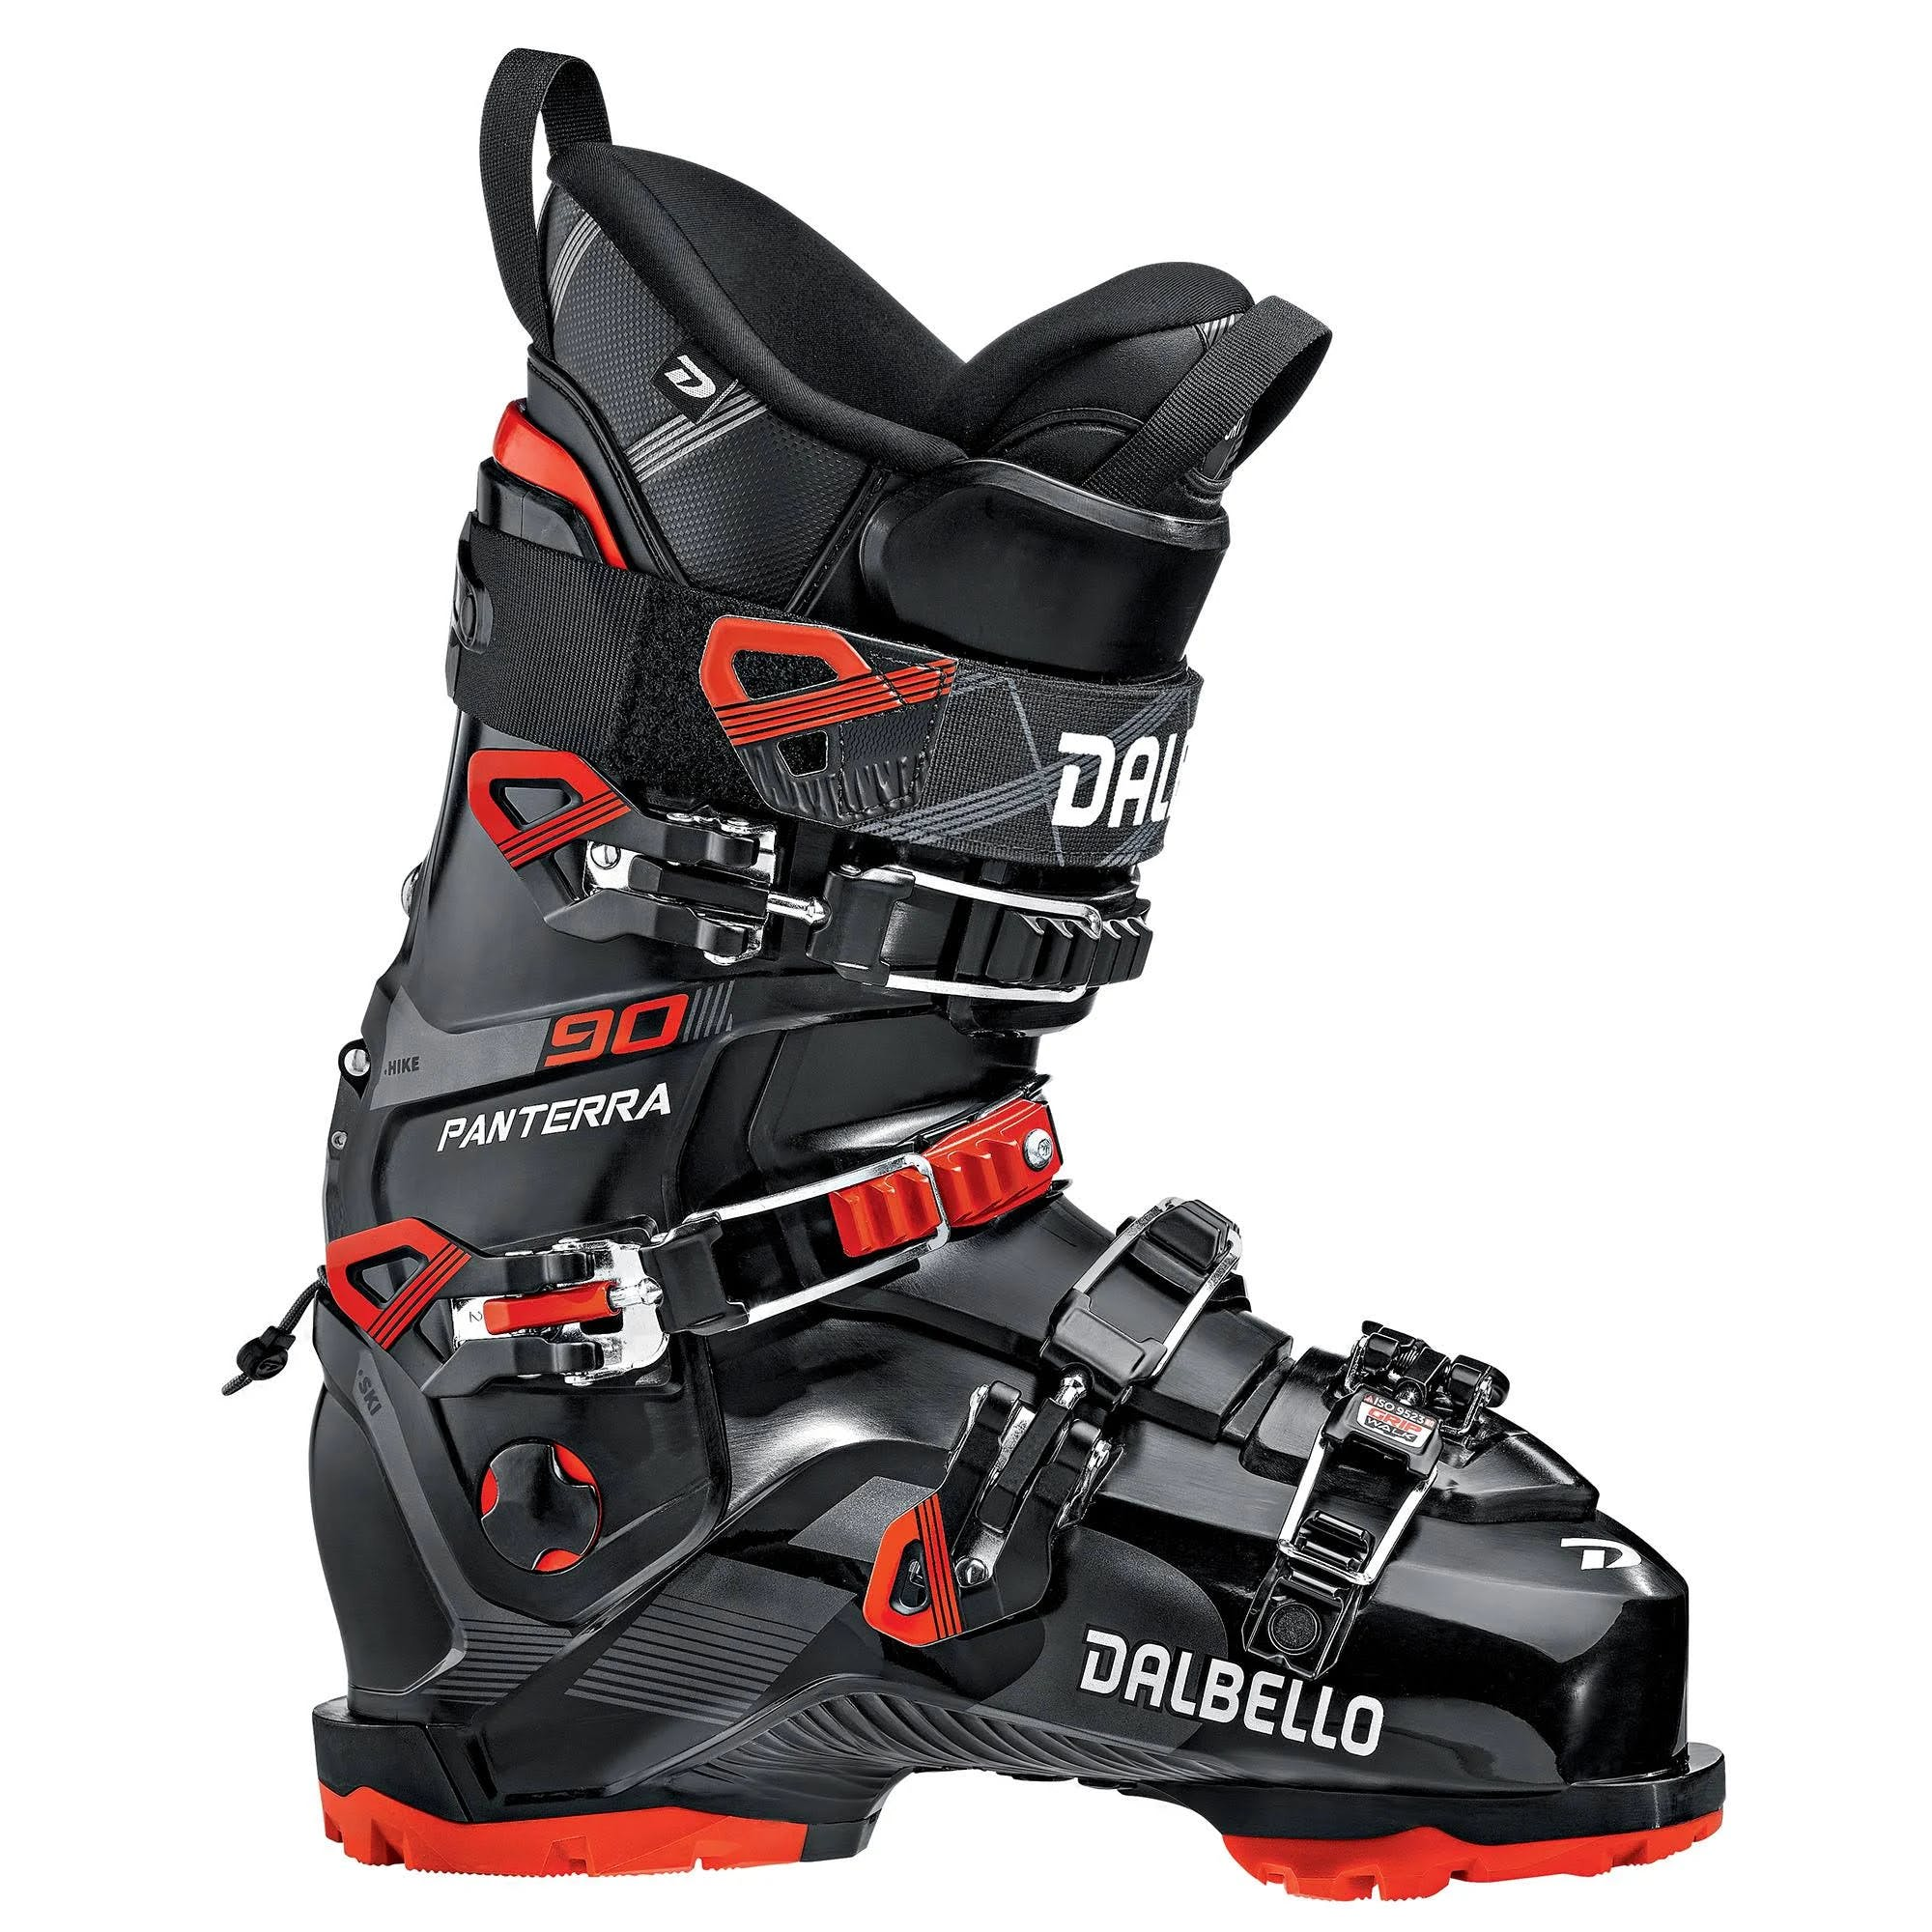 Dalbello Panterra 90 Gw Ski Boots 26.5 Black/red